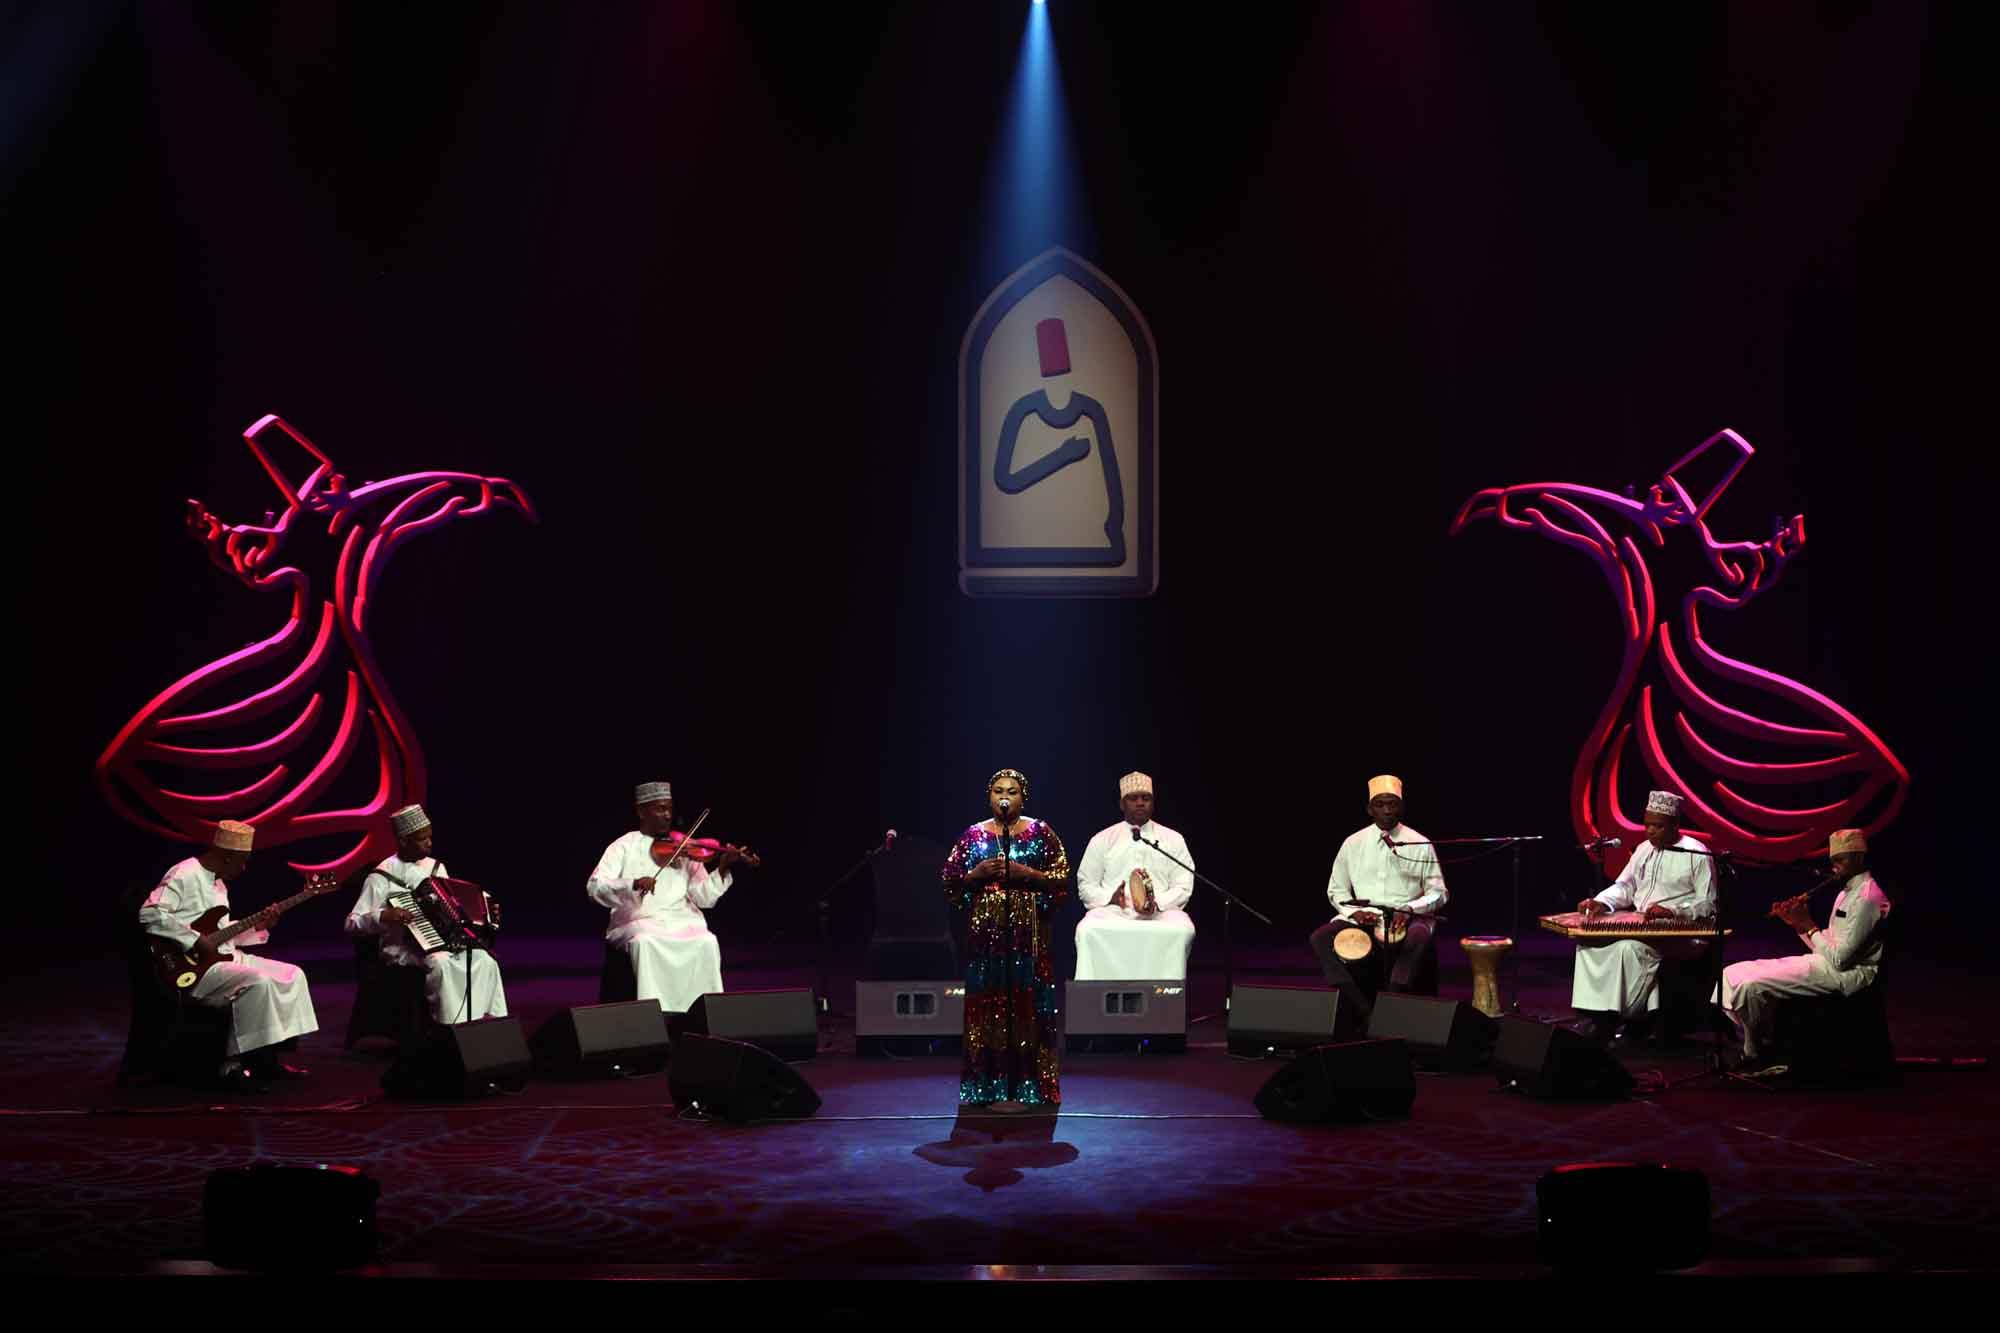 tanzanyadan-rajab-suleiman-konyada-konser-verdi-001.jpg